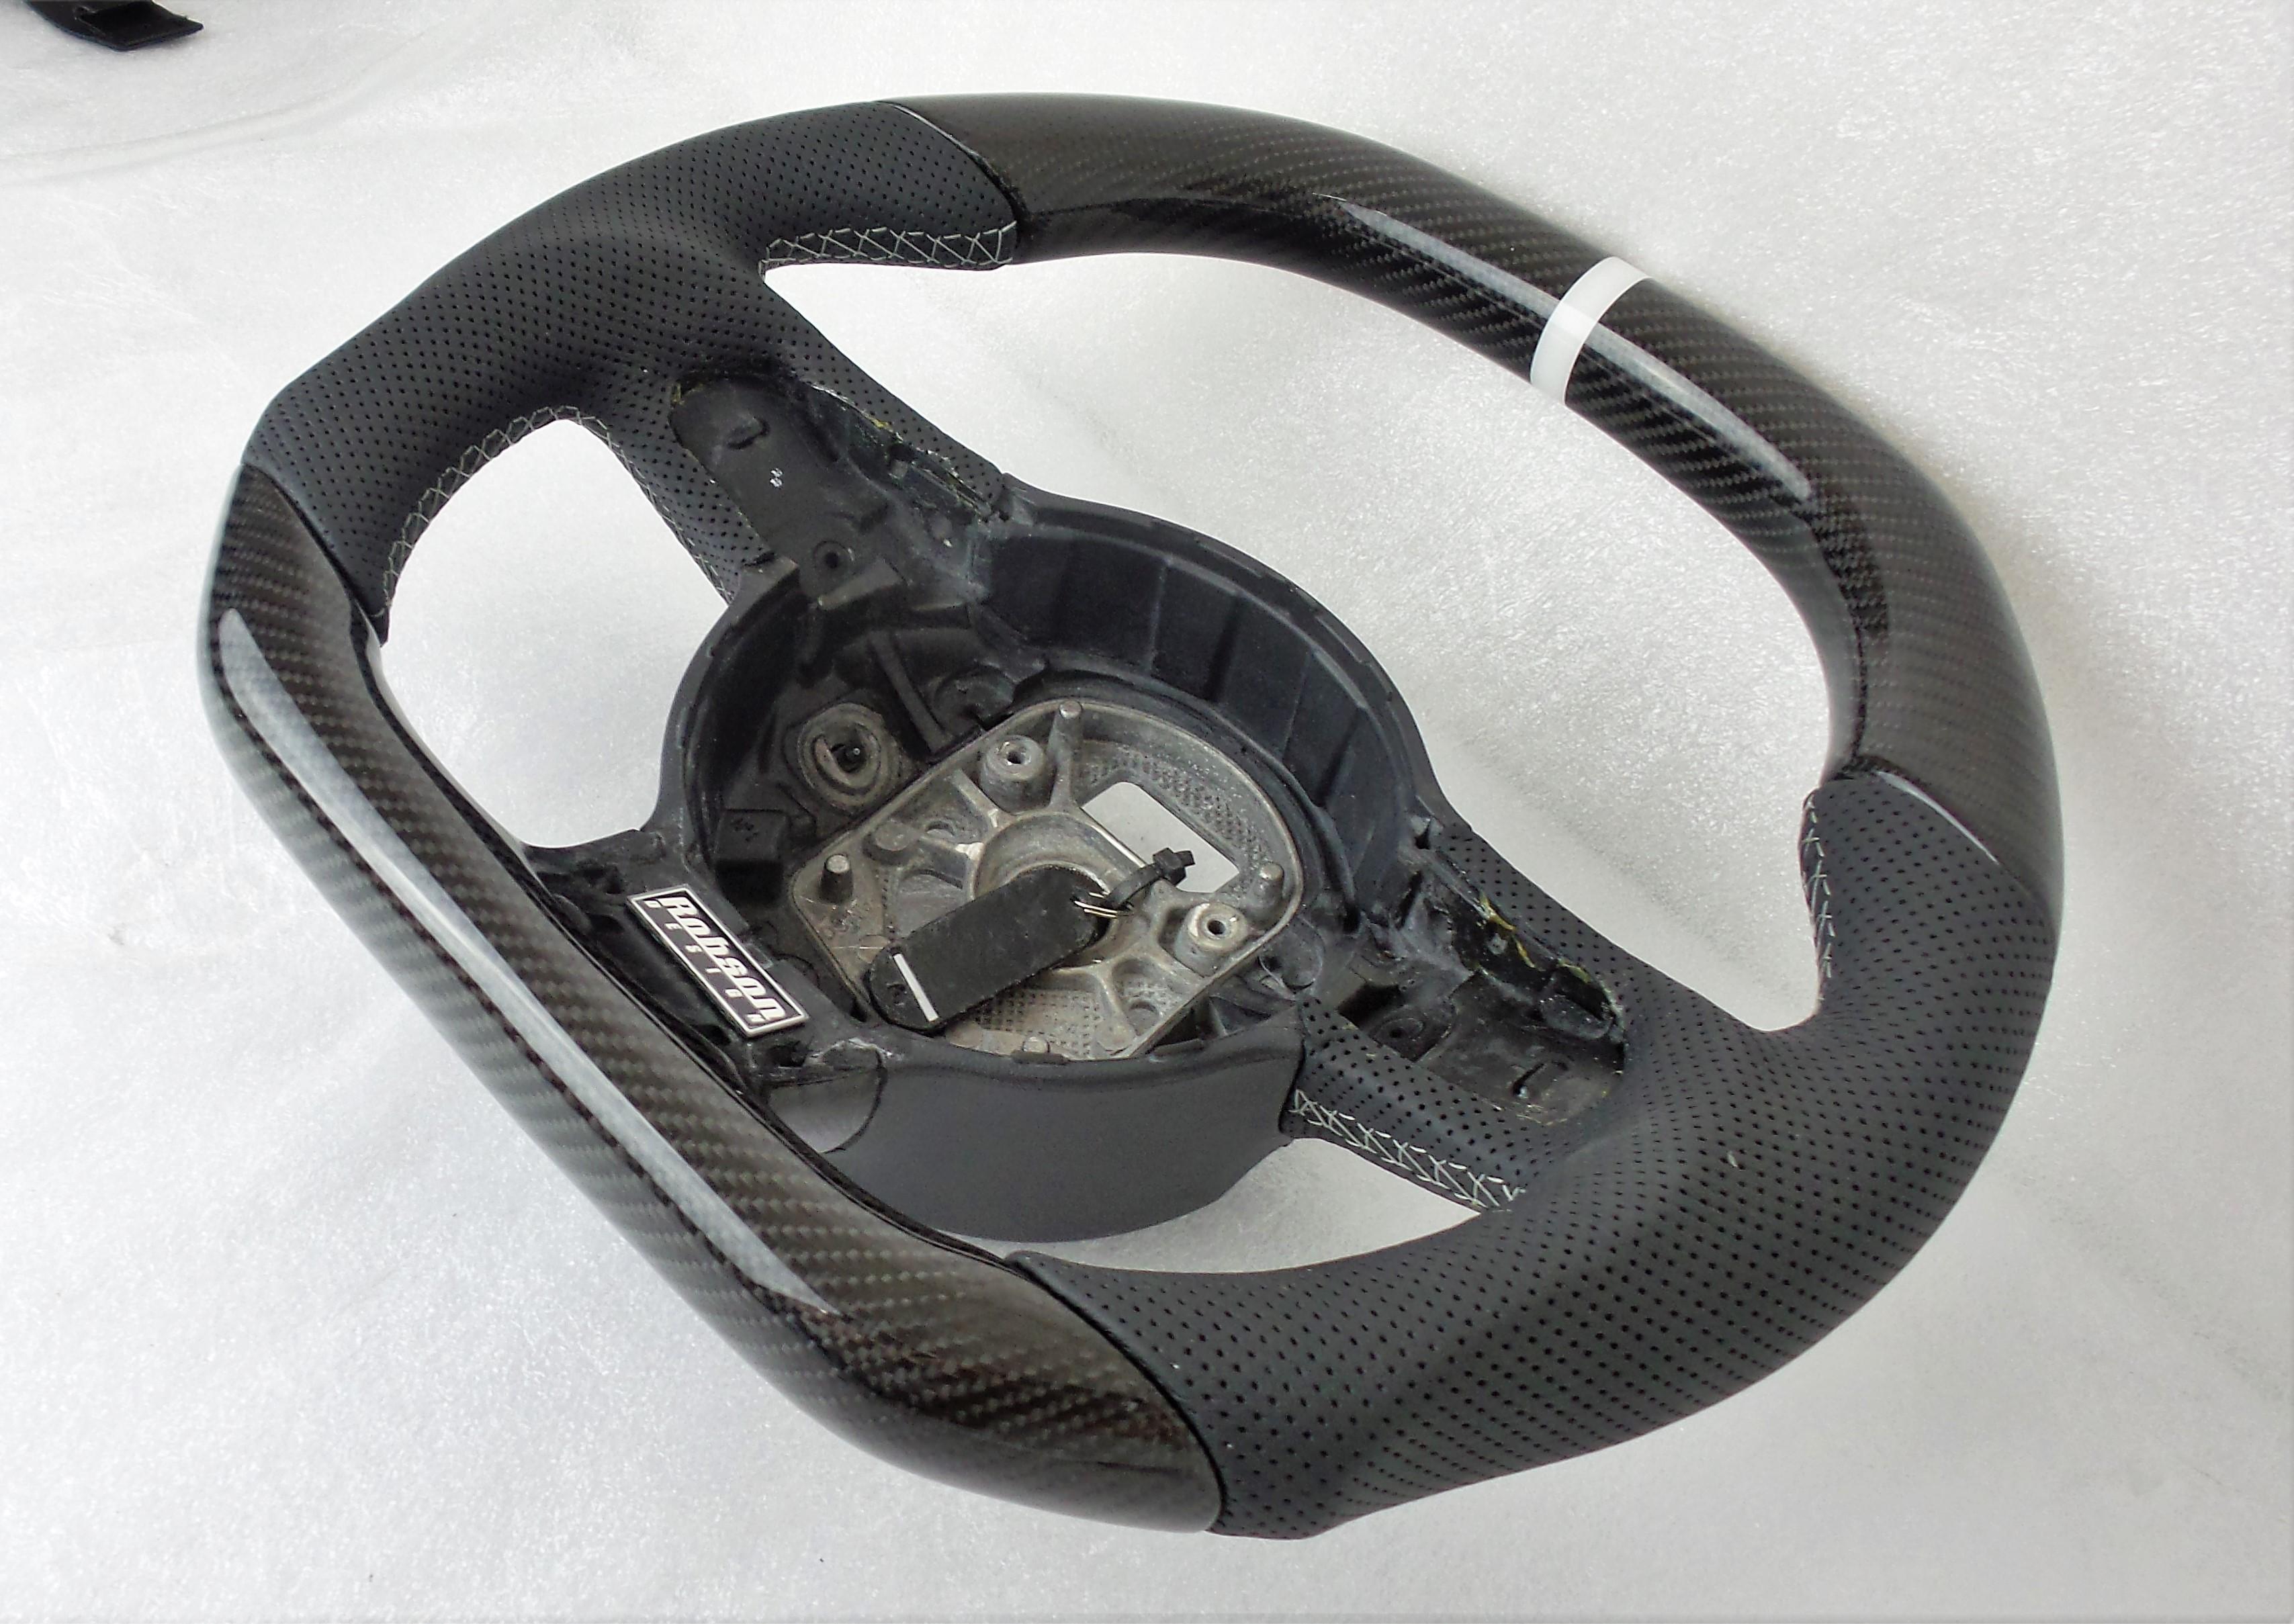 Audi R8 Steering Wheel In Carbon Fiber Robson Design Carbon Fiber